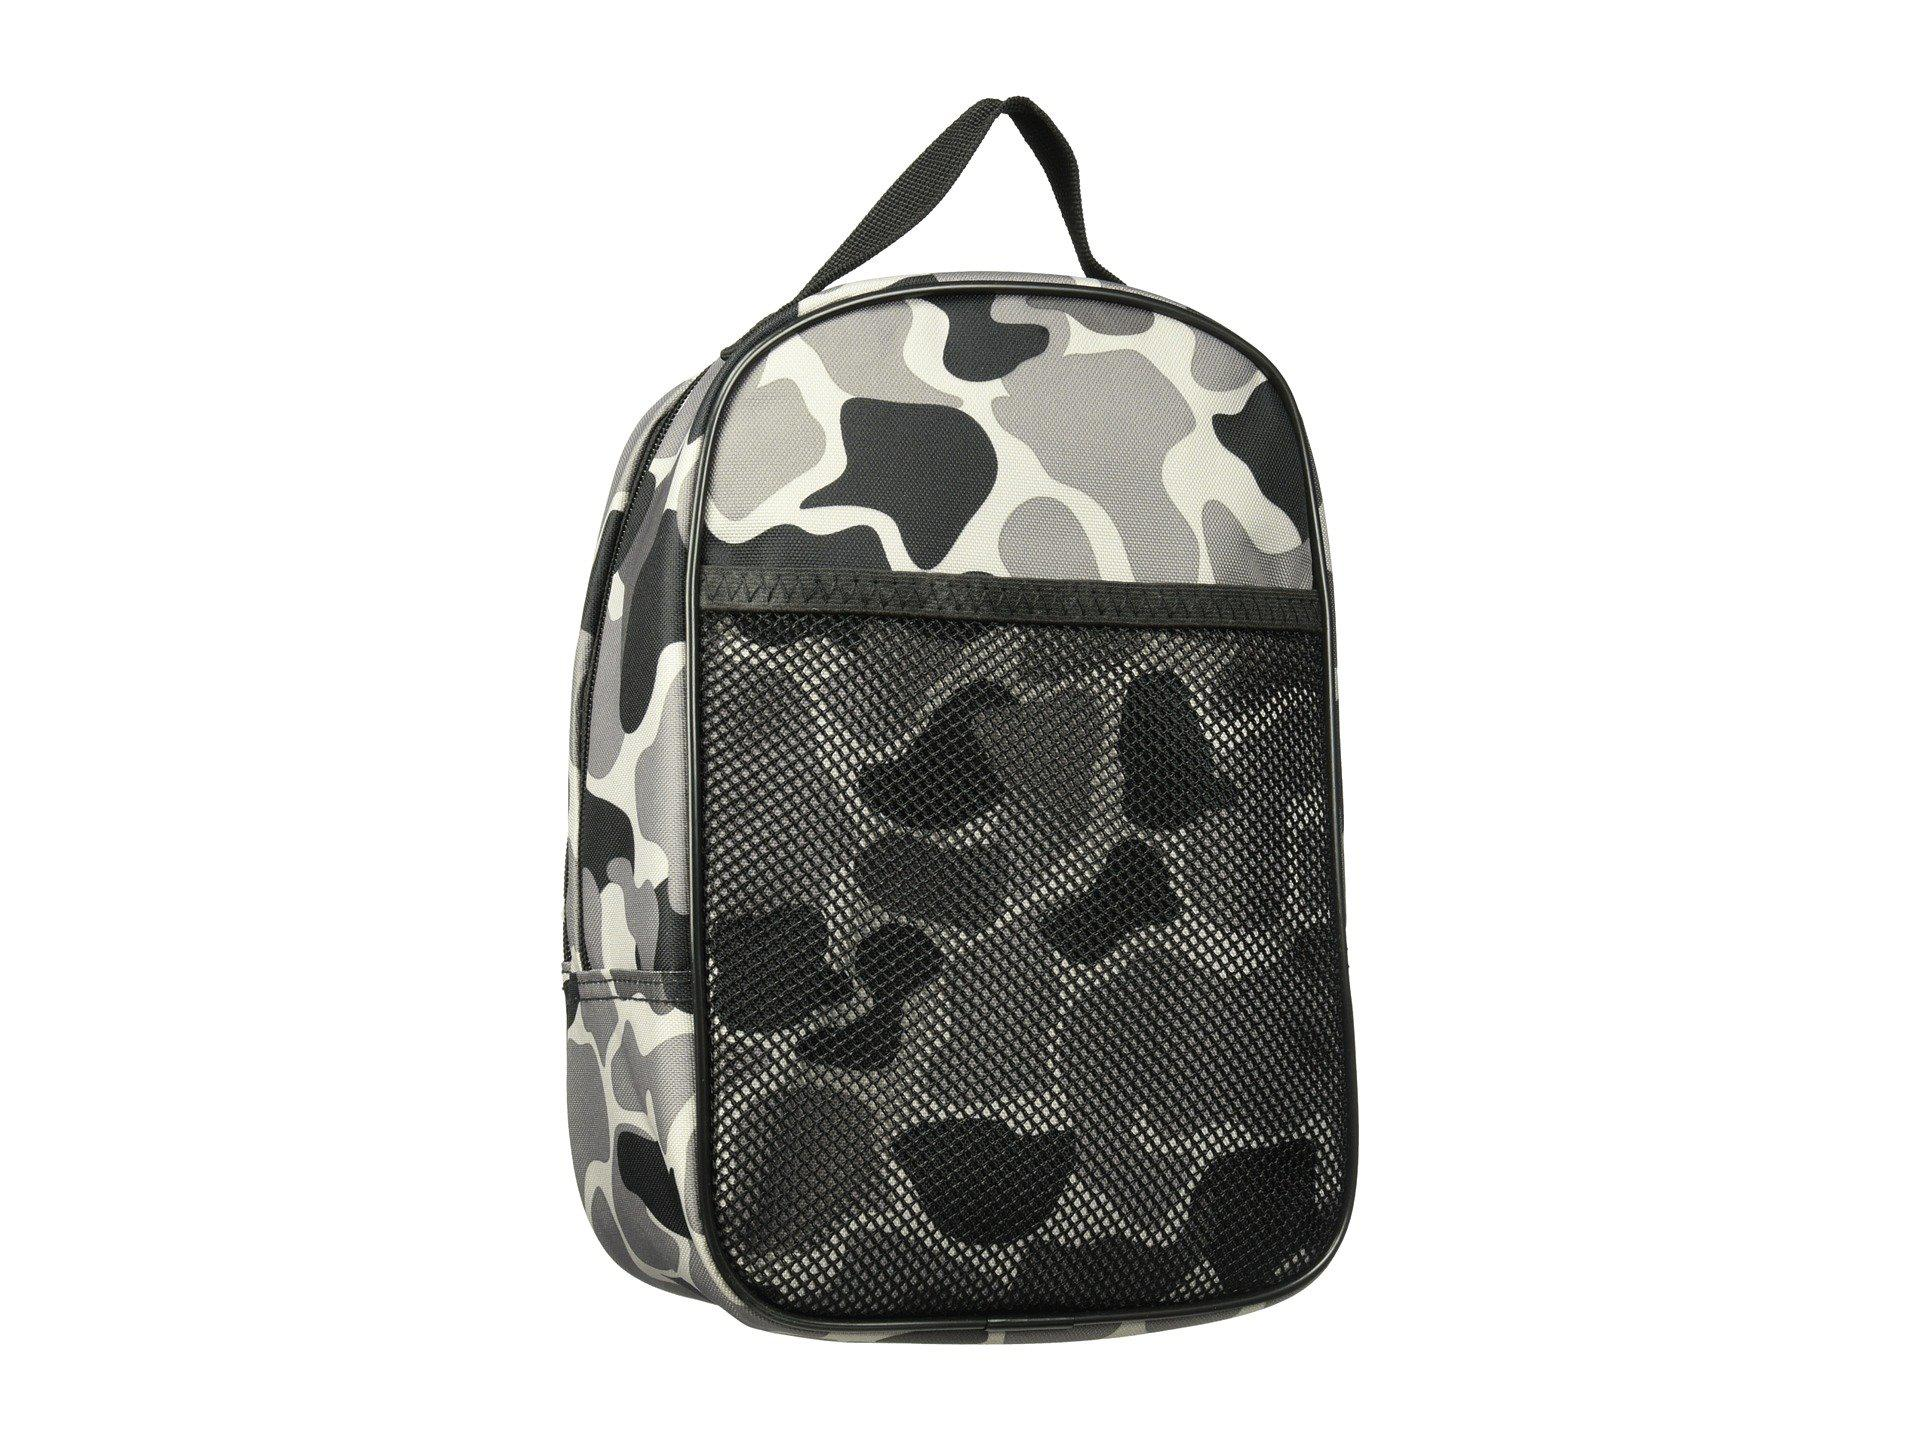 c44407c596 Lyst - adidas Originals Originals Santiago Lunch Bag (camo Aop ...